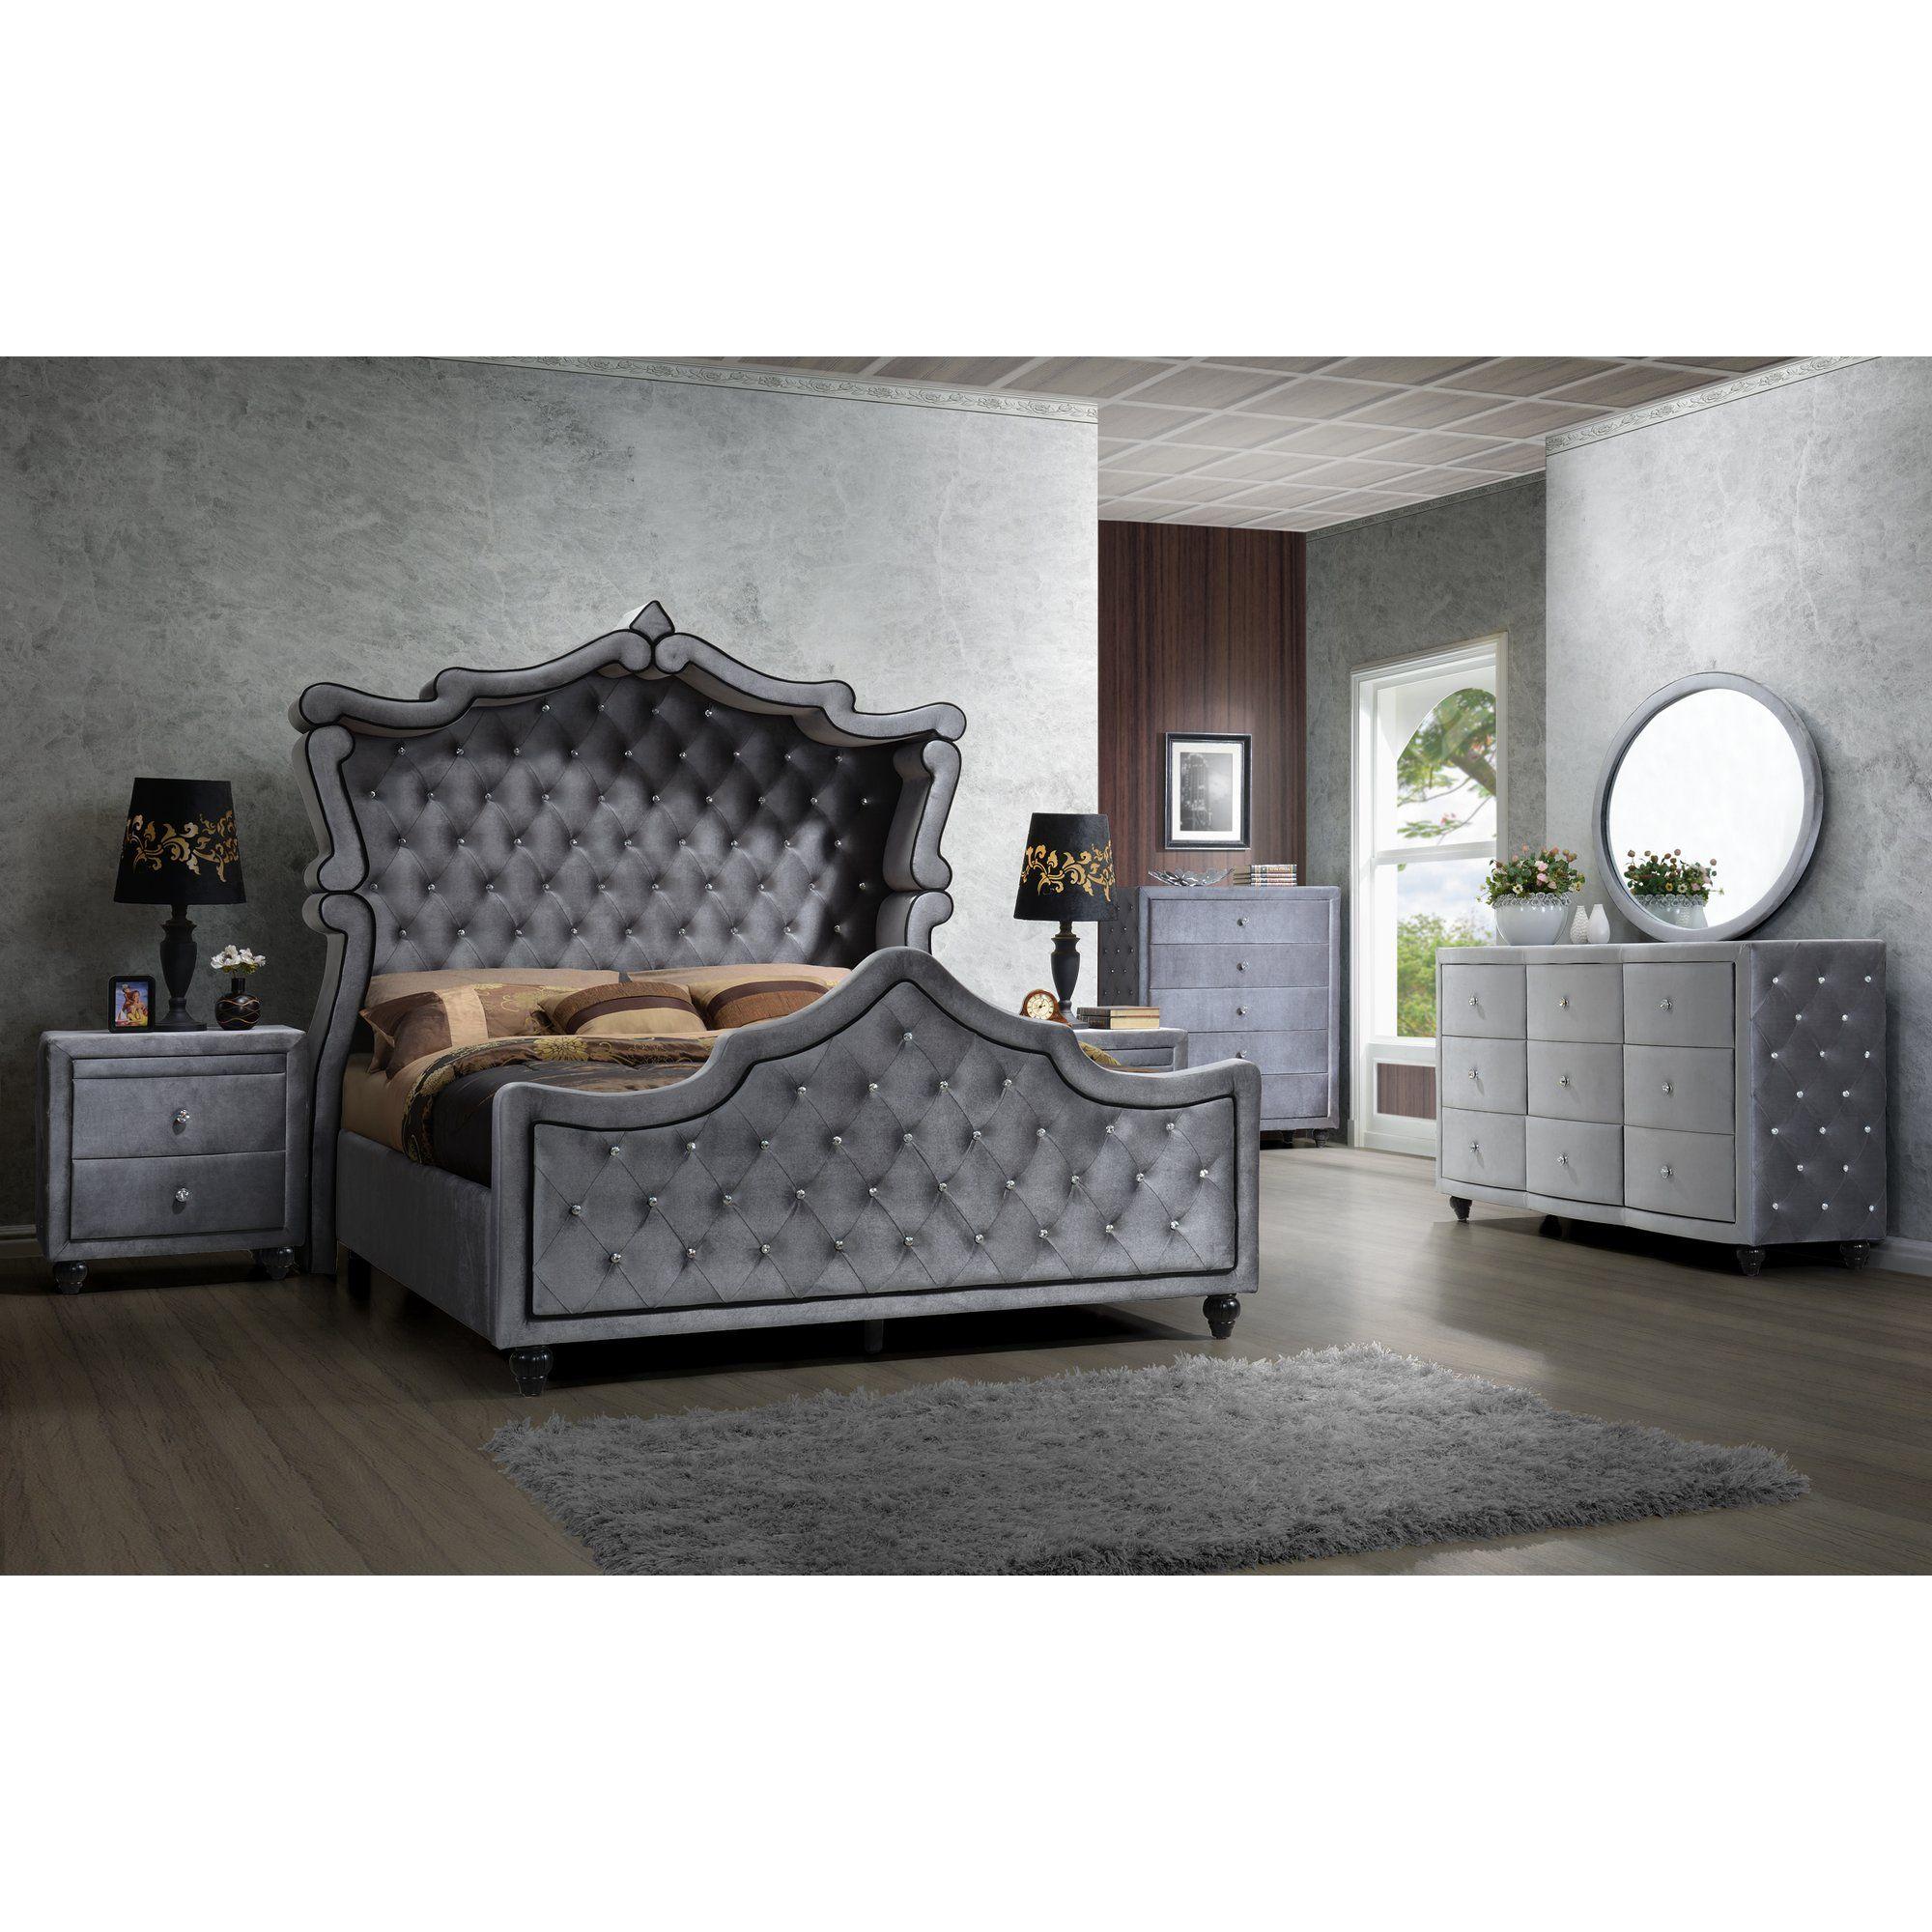 Grant Upholstered Sleigh Bed Upholstered sleigh bed